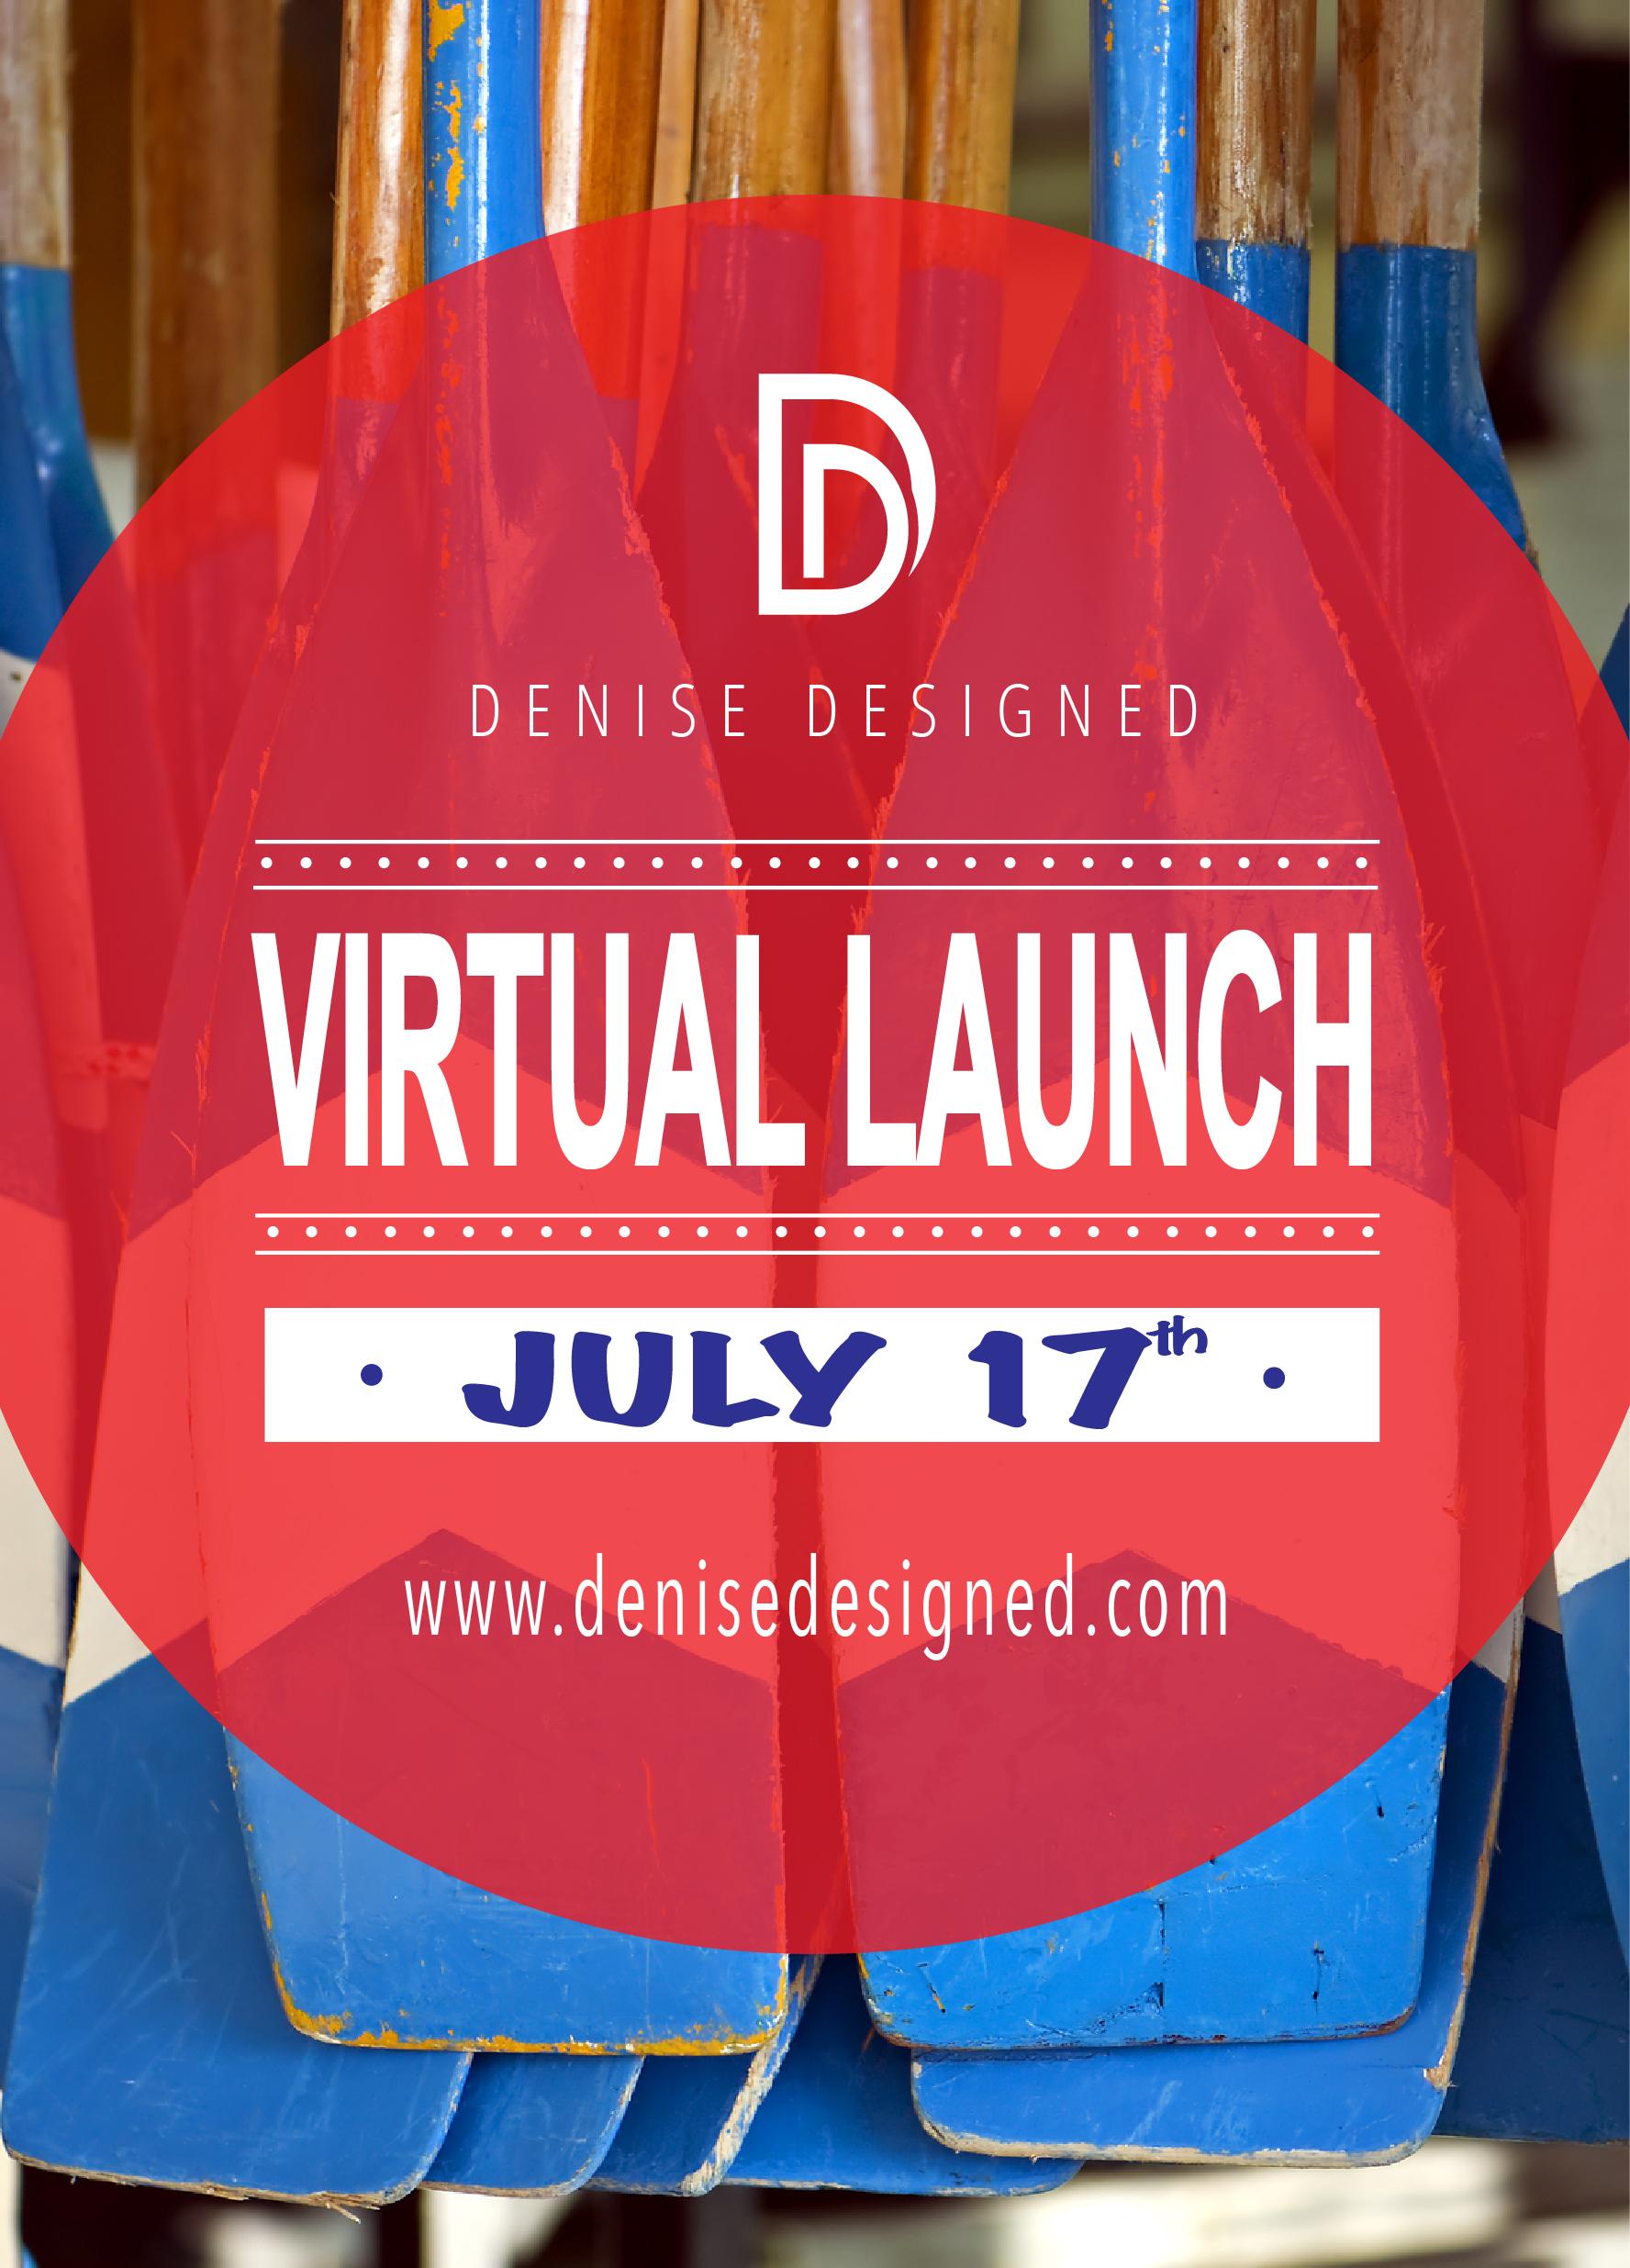 Denise Designed Virtual Launch (final)-01.jpg